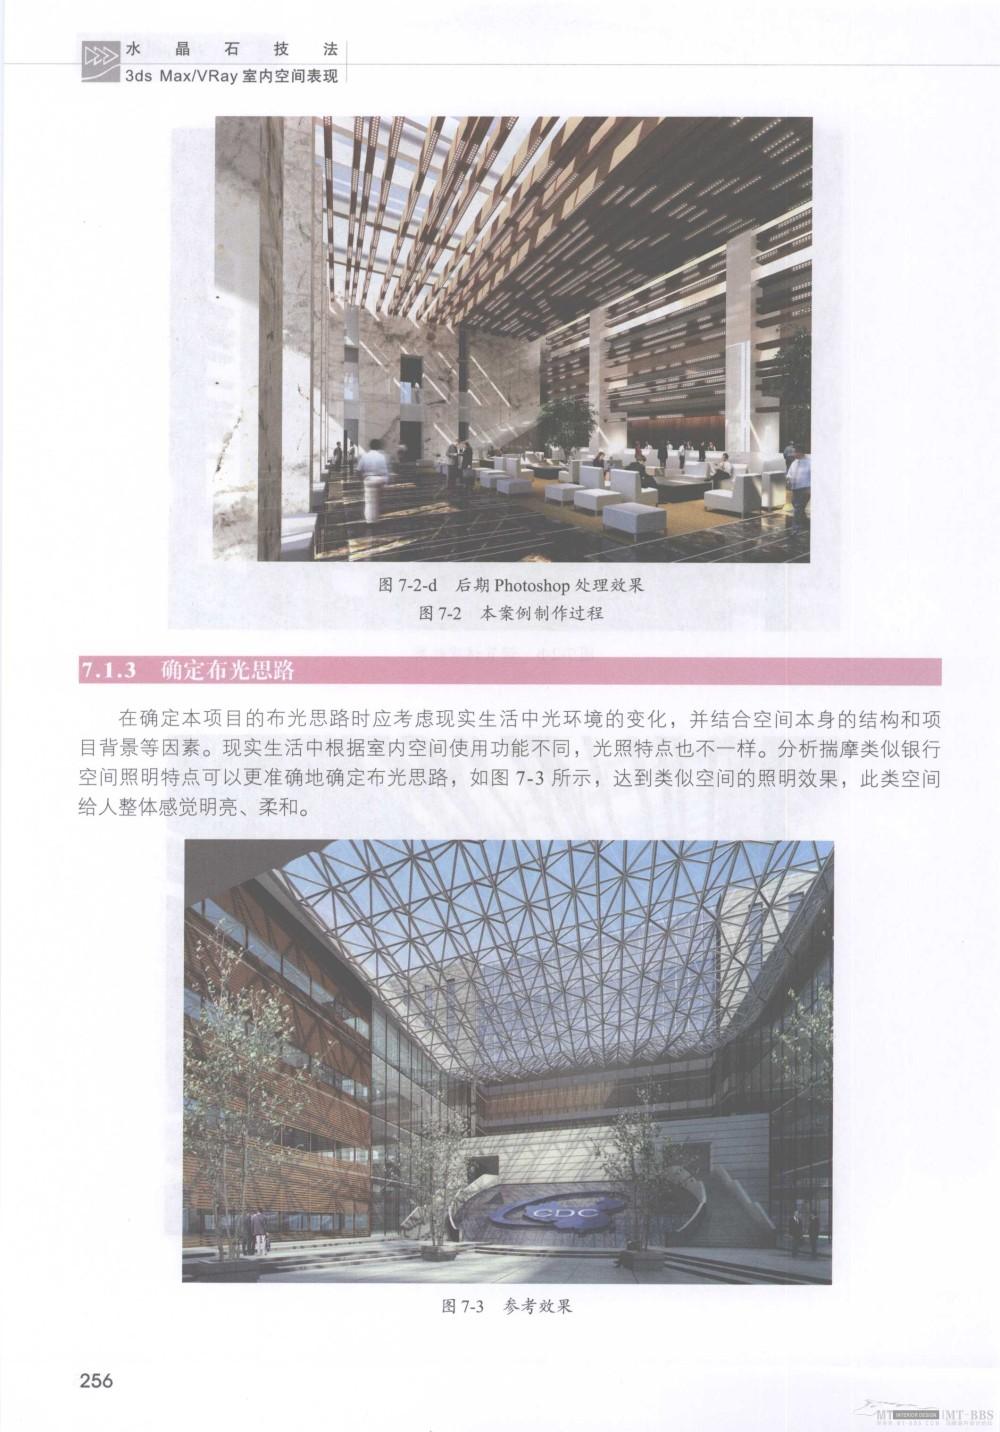 水晶石技法-3ds_Max&VRay室内空间表现_水晶石技法-3ds_Max&VRay室内空间表现_页面_262.jpg